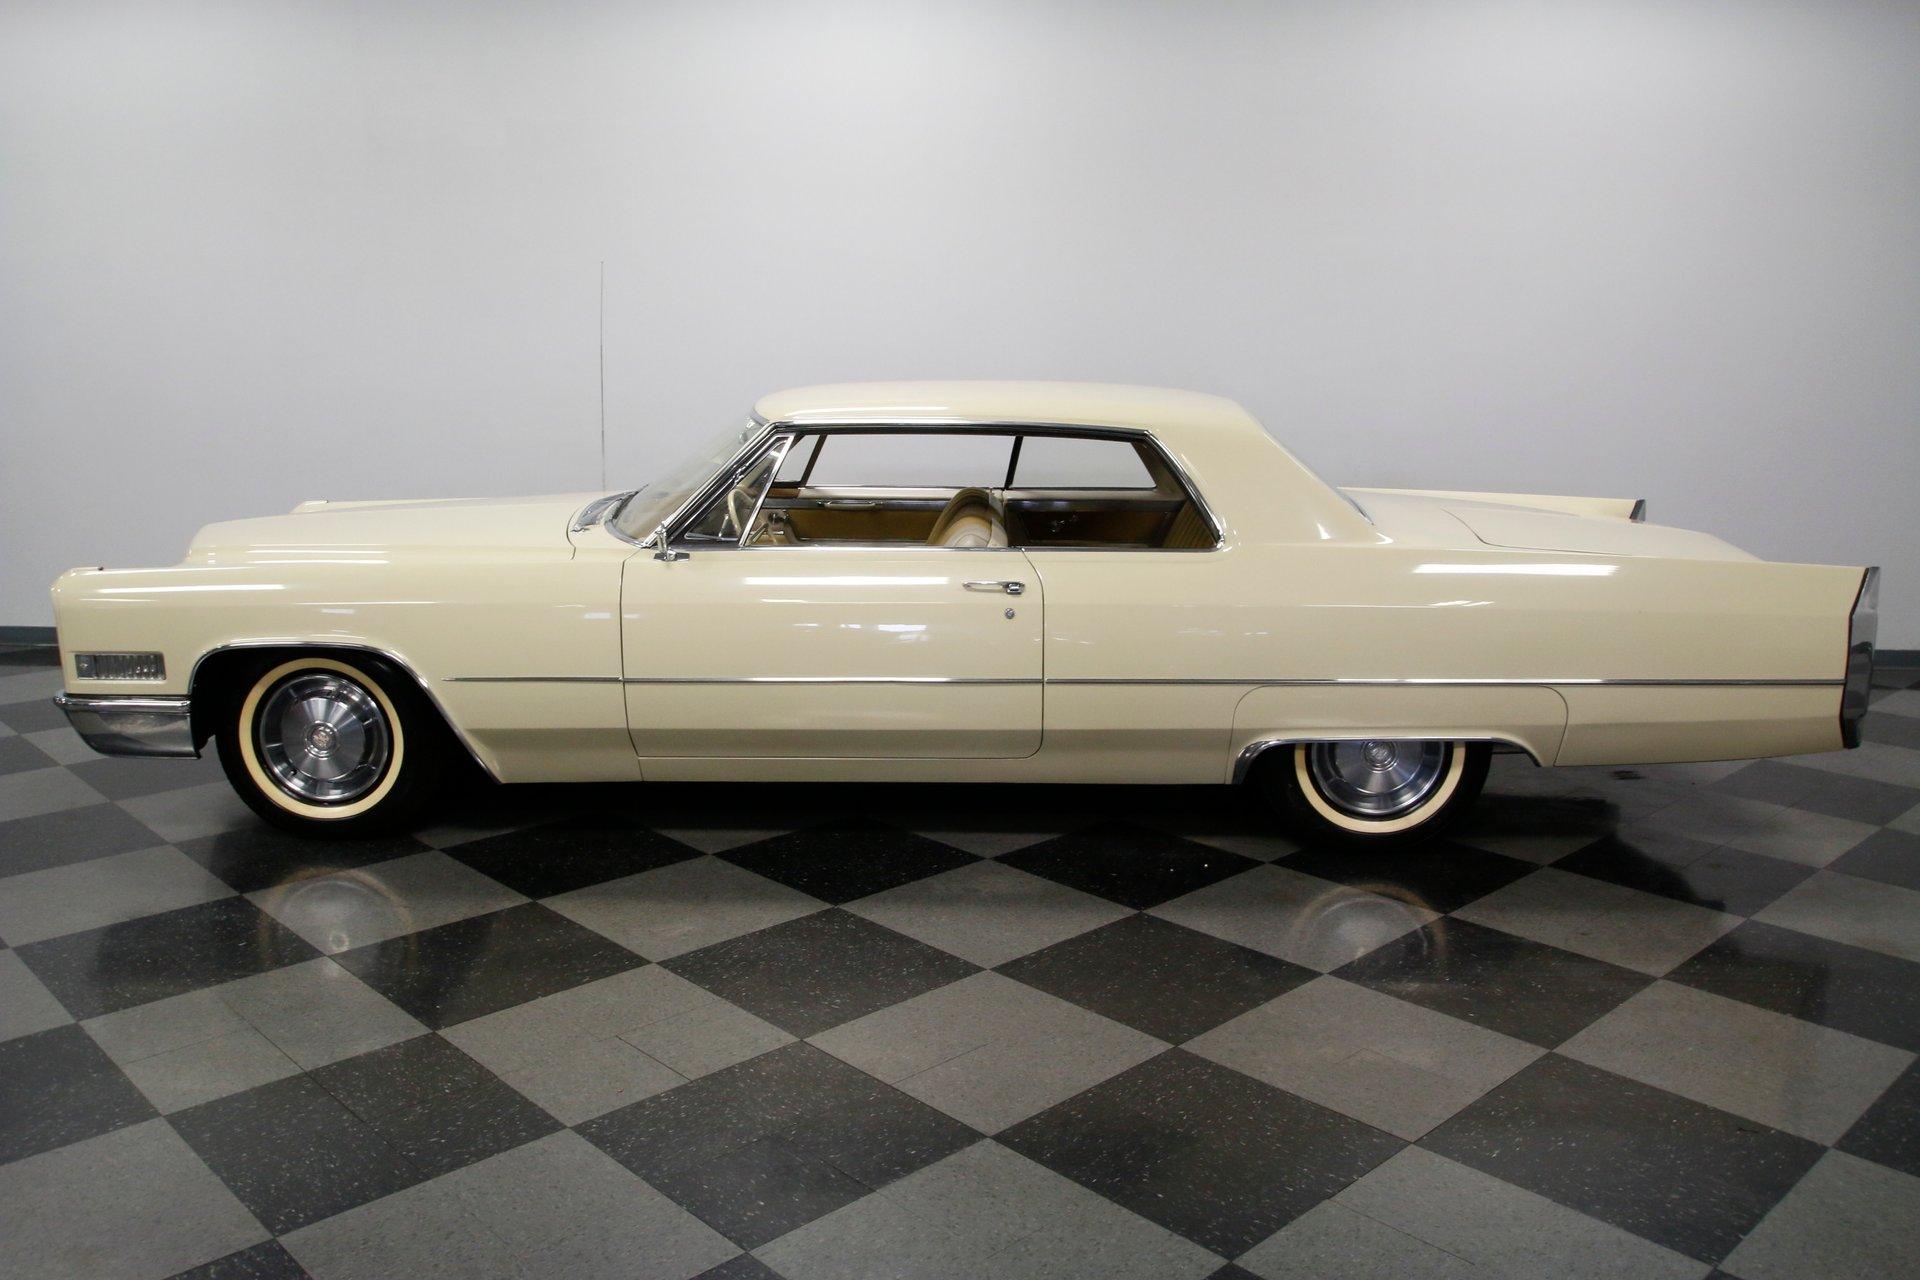 1966 Cadillac Calais Streetside Classics The Nation S Trusted